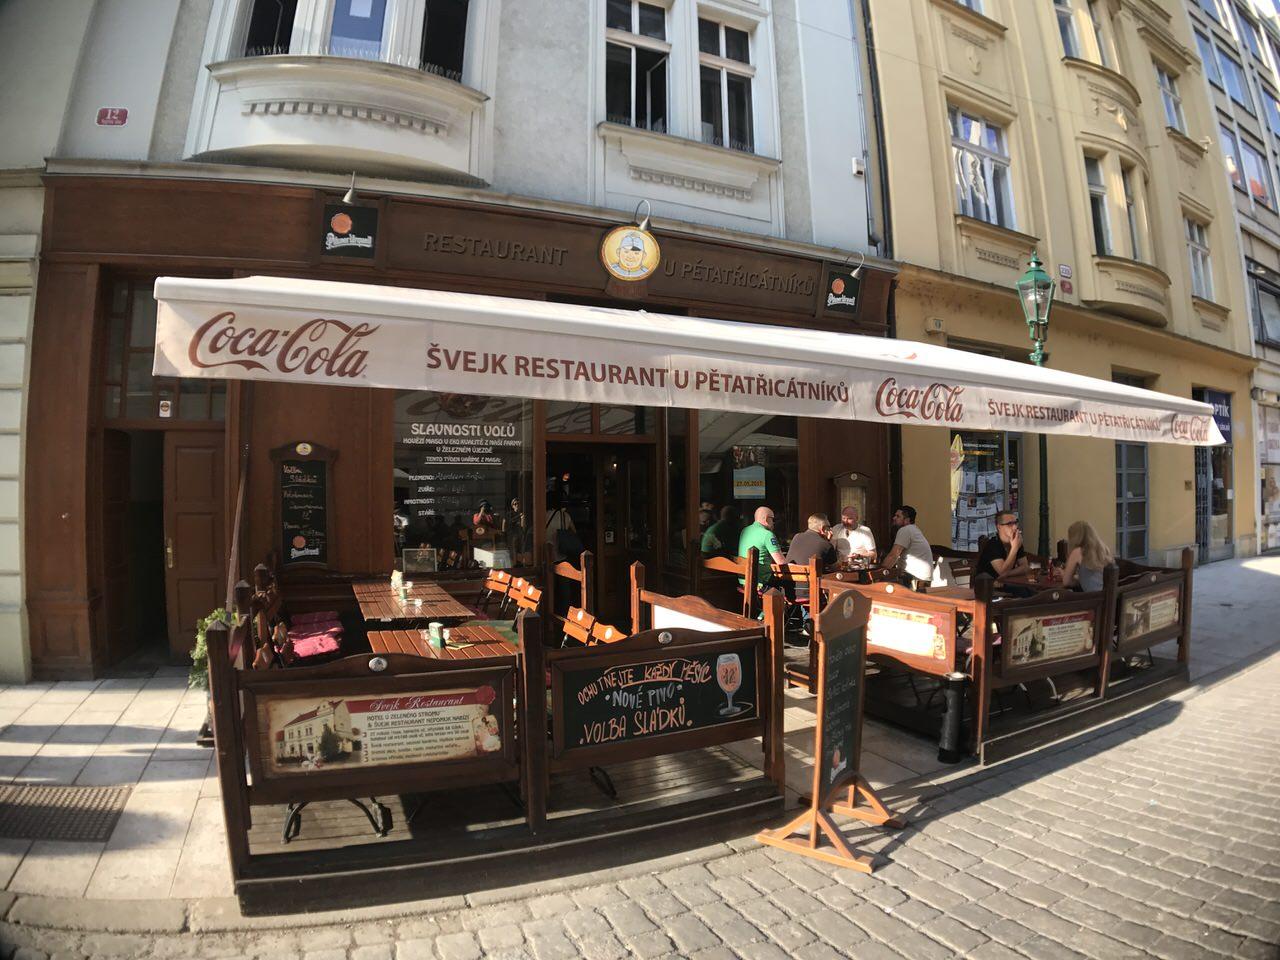 「U Petatricatniku」真っ白いビールの飲み方ができる #プルゼニュ のレストラン #チェコへ行こう #visitCzech